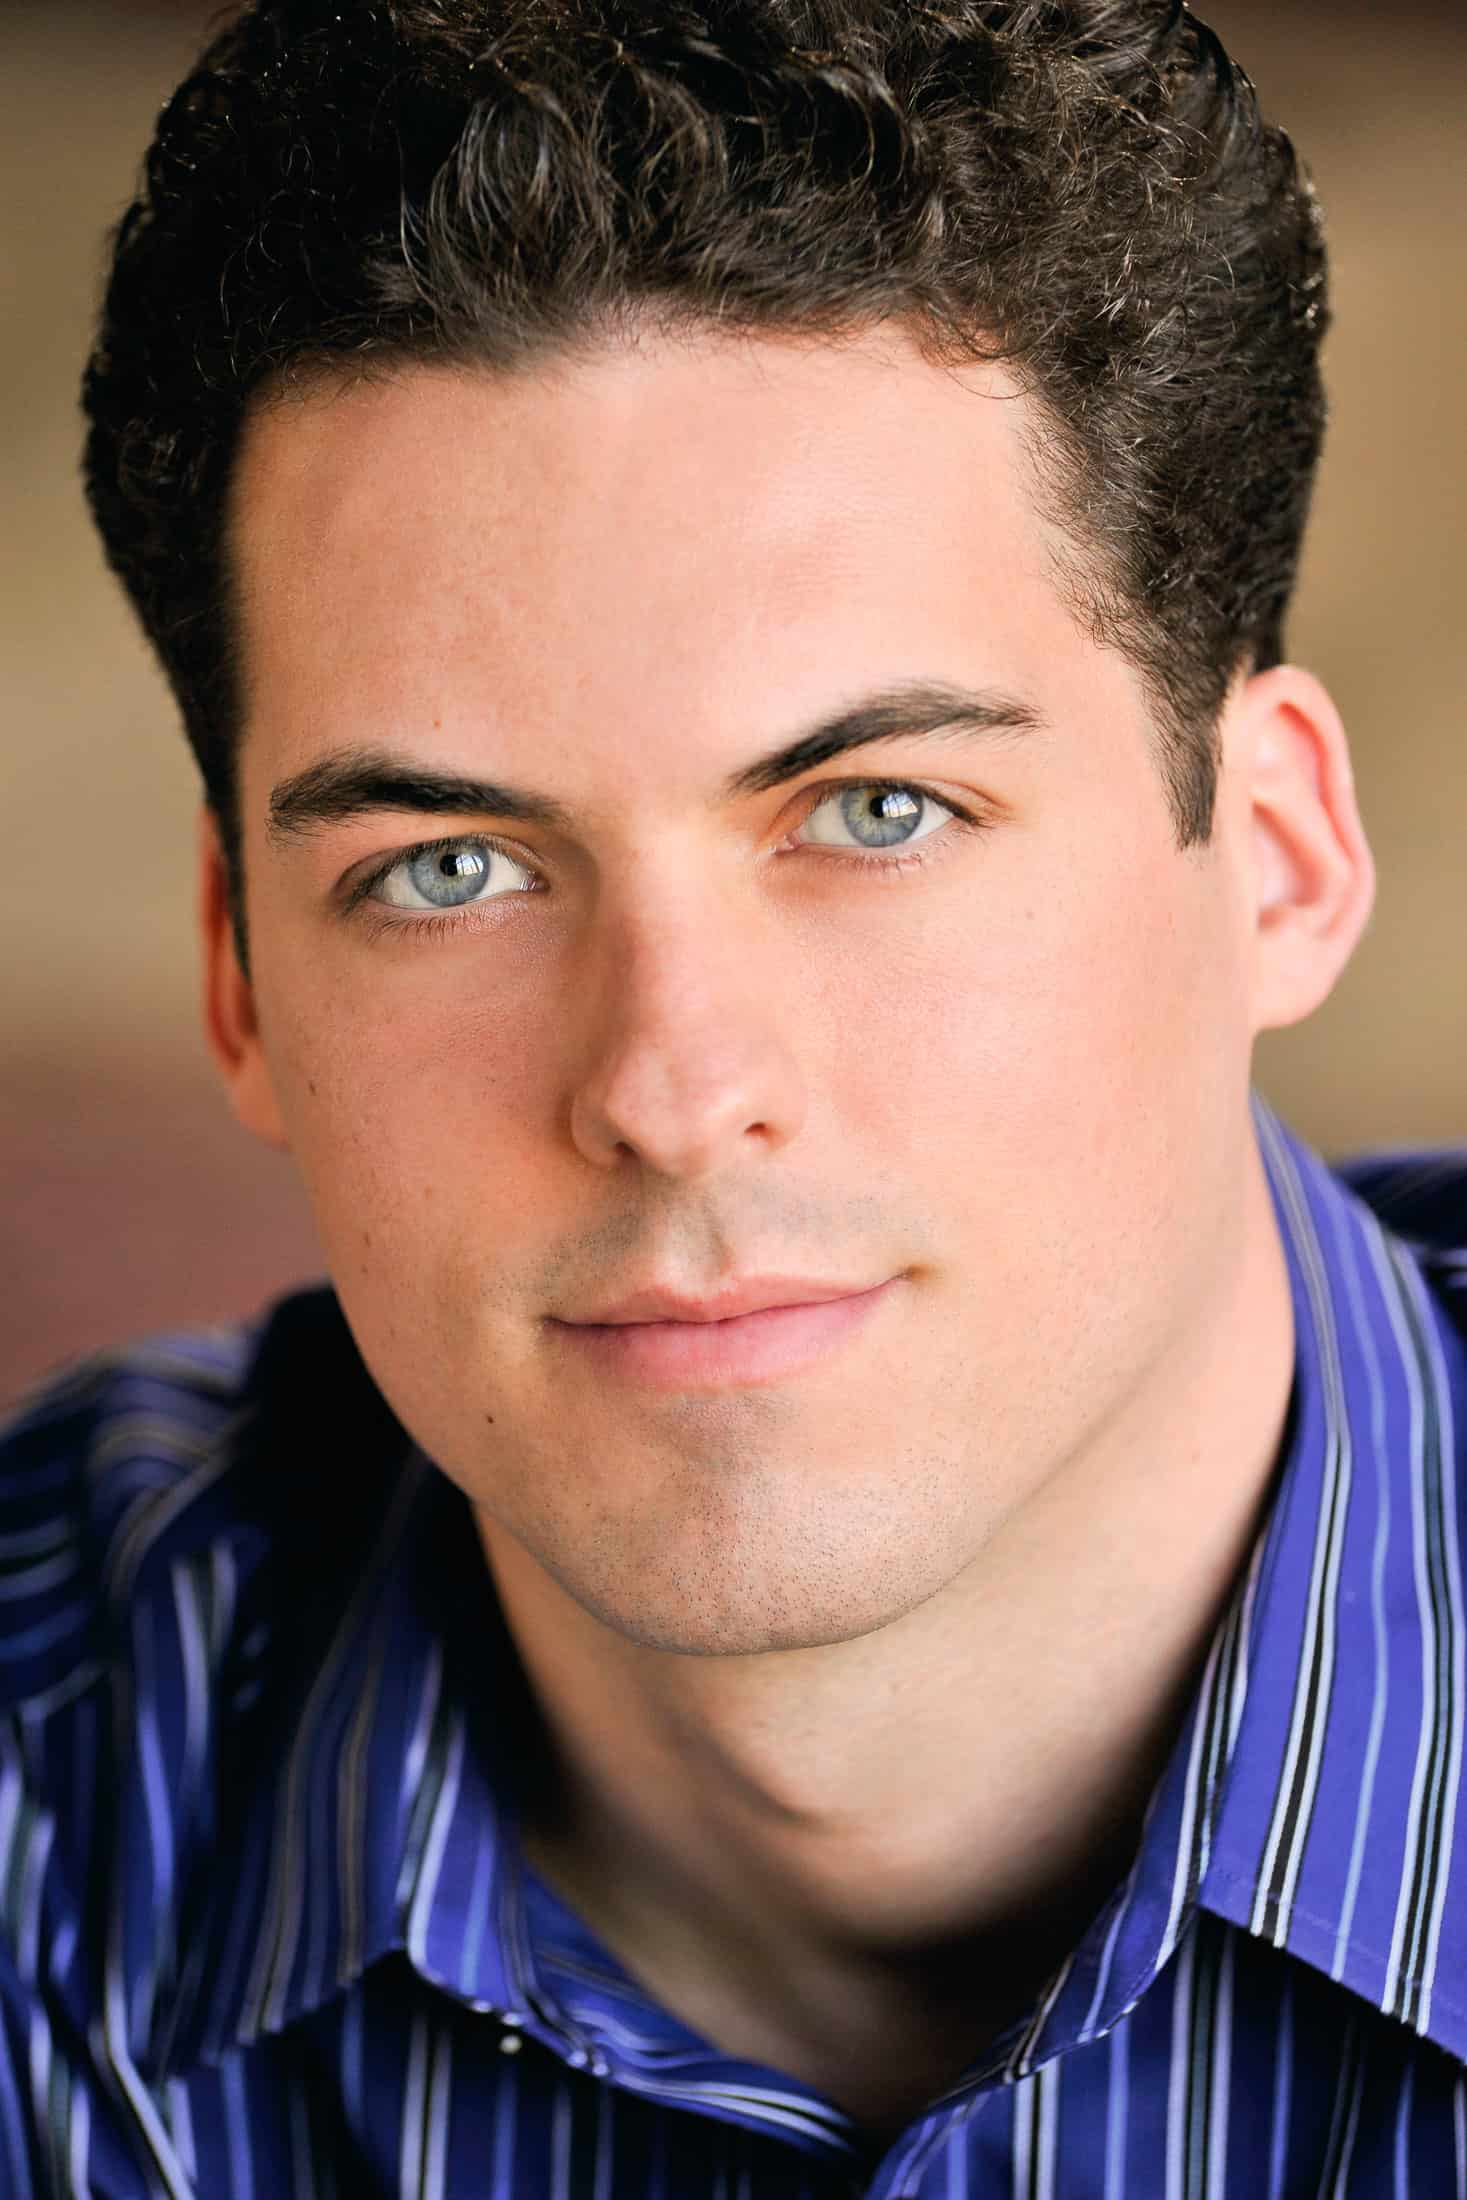 Headshots NYC - Actor Headshots Joseph Q